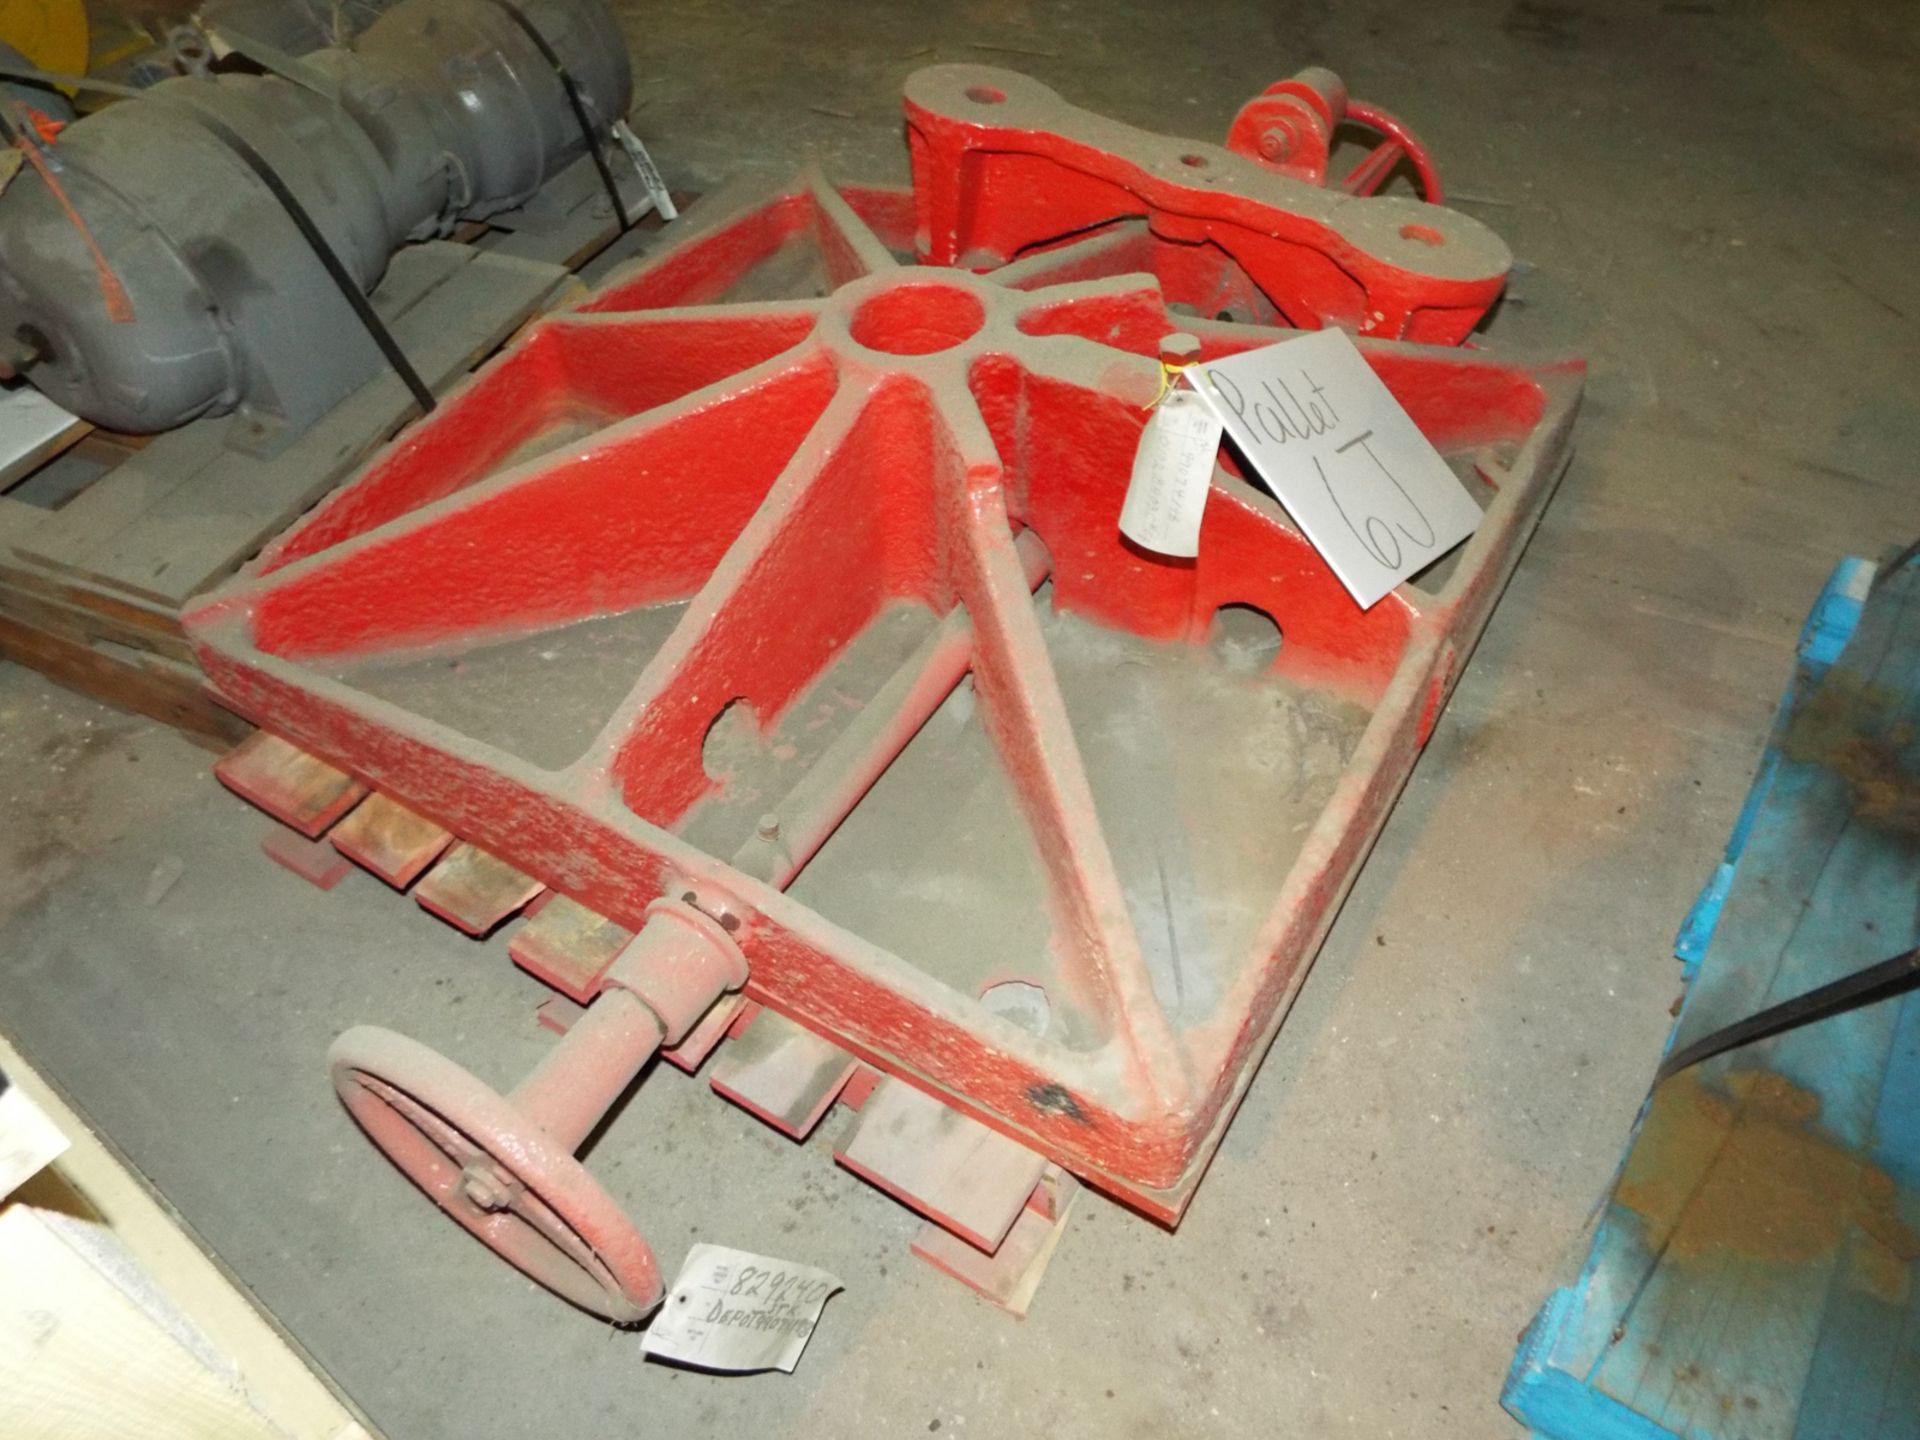 Lot 33 - LOT/ CONTENTS OF SKID - SHRIVER PRESS FOLLOWER PLATE (PLT 6J)